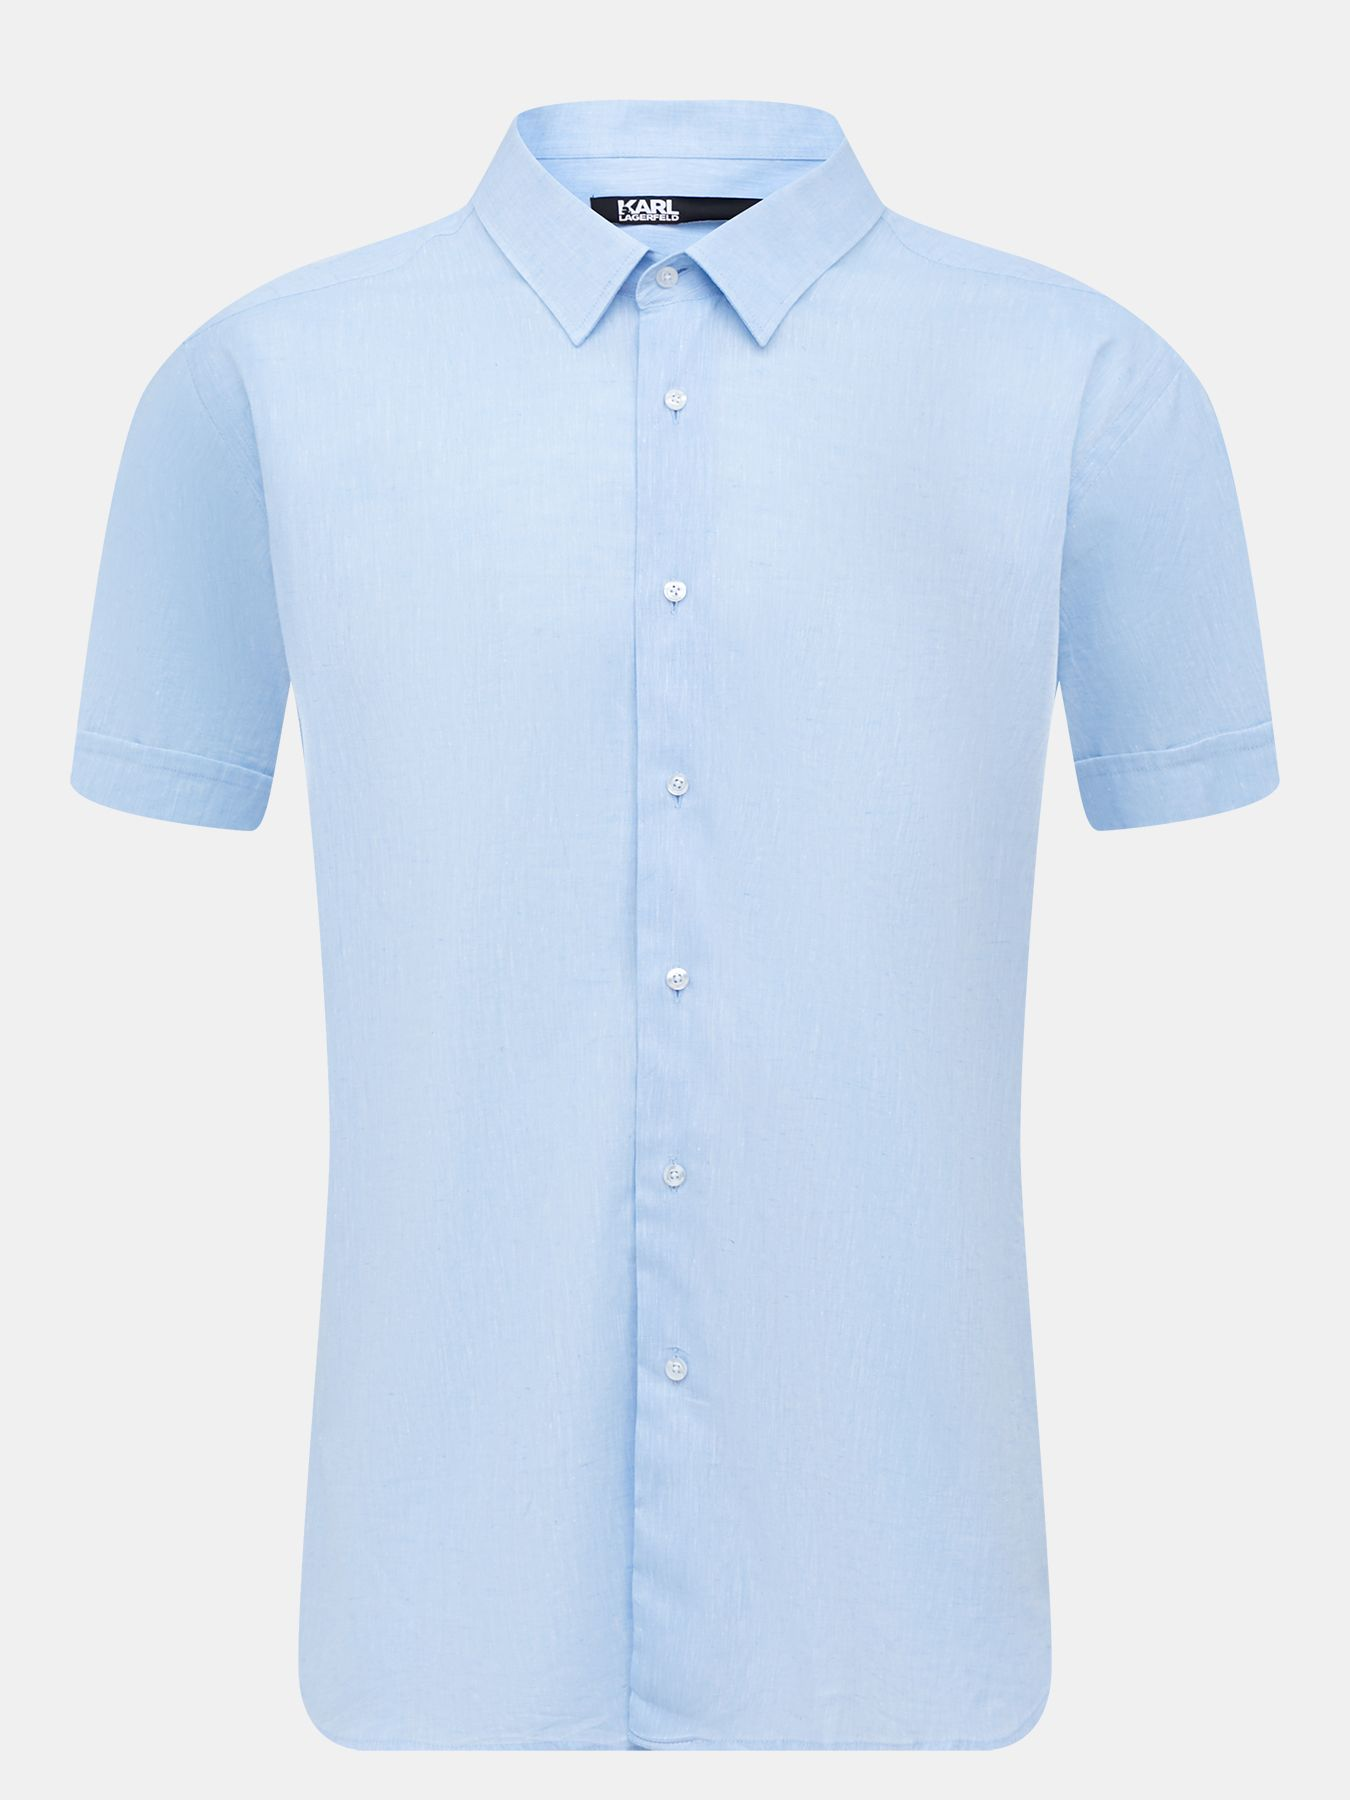 Karl Lagerfeld Karl Lagerfeld Мужская рубашка